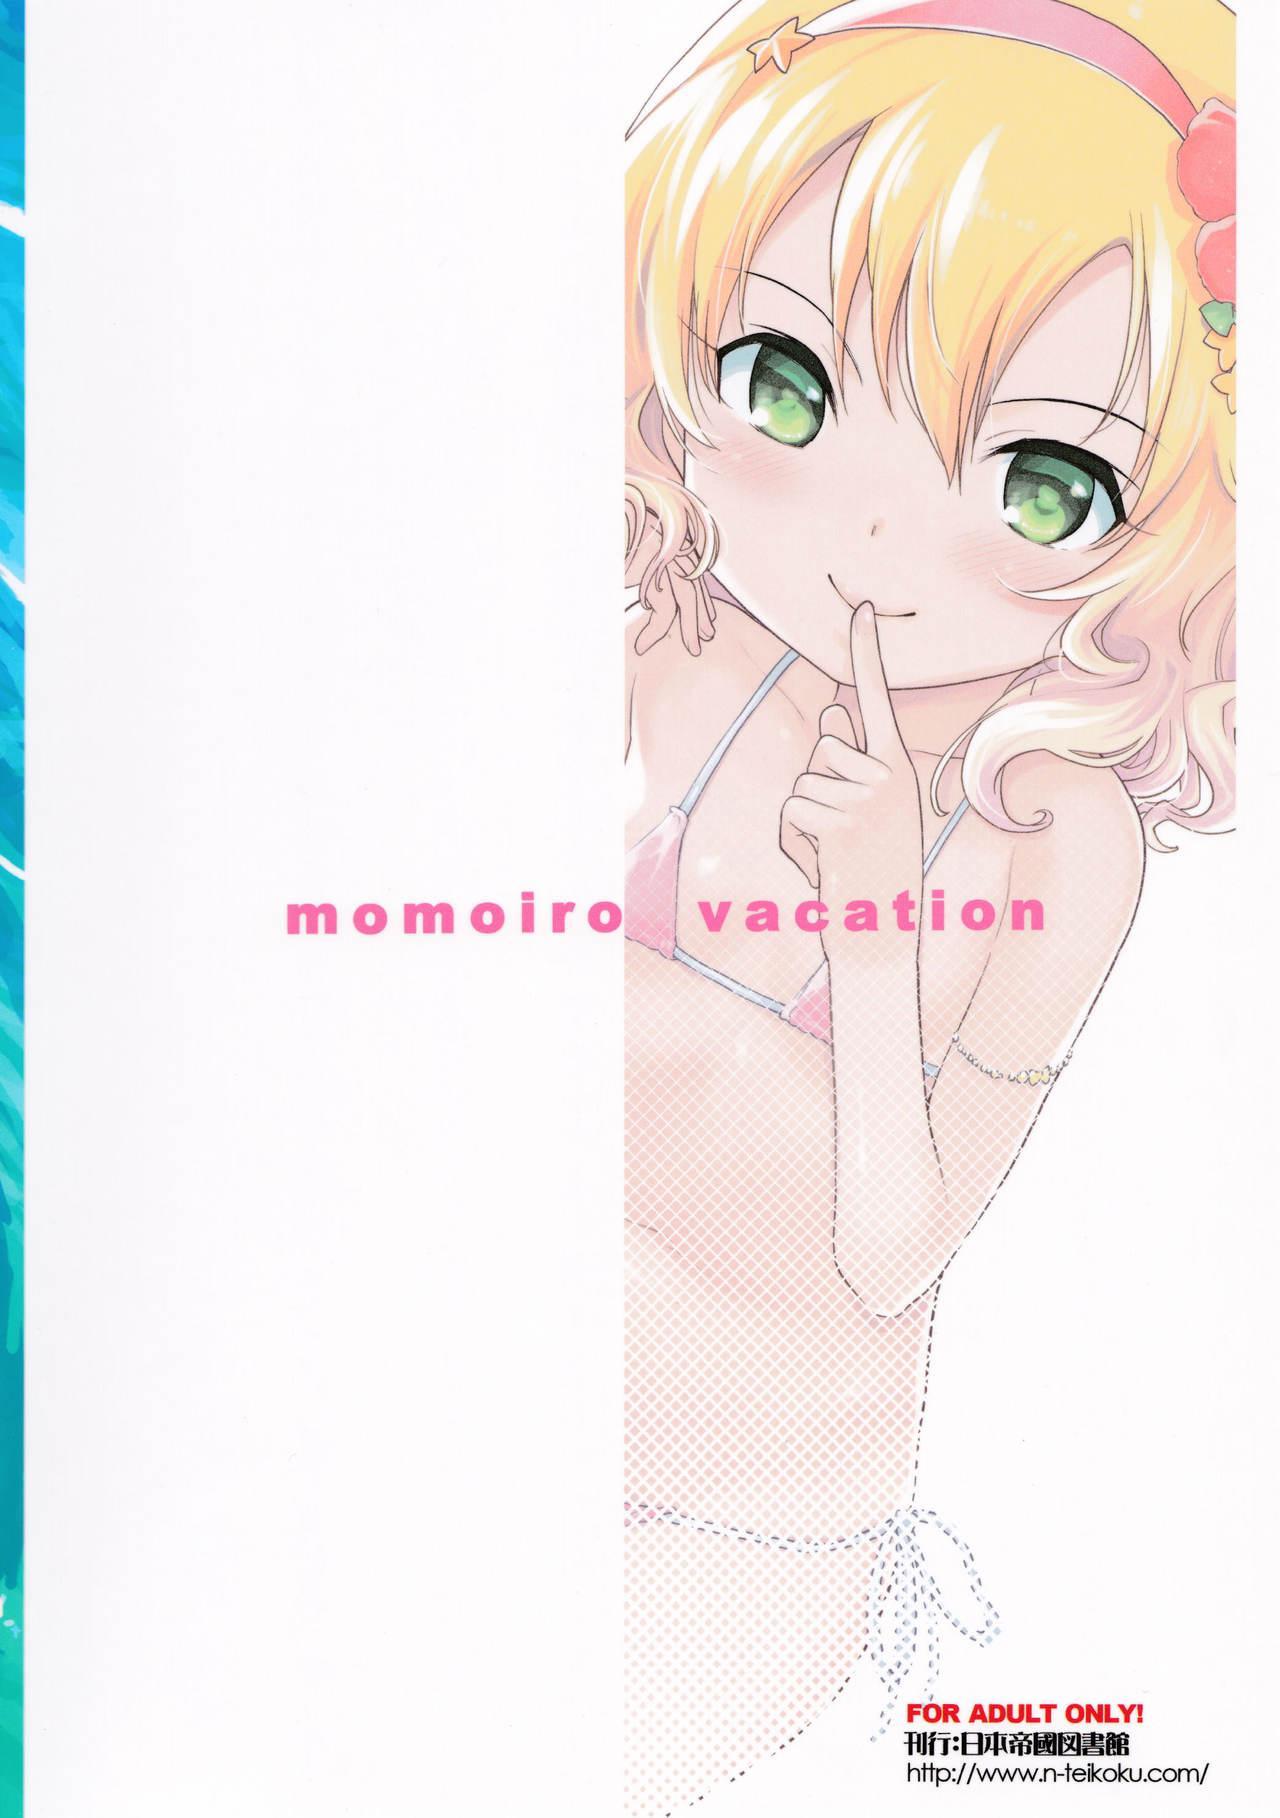 Momoiro Vacation 15